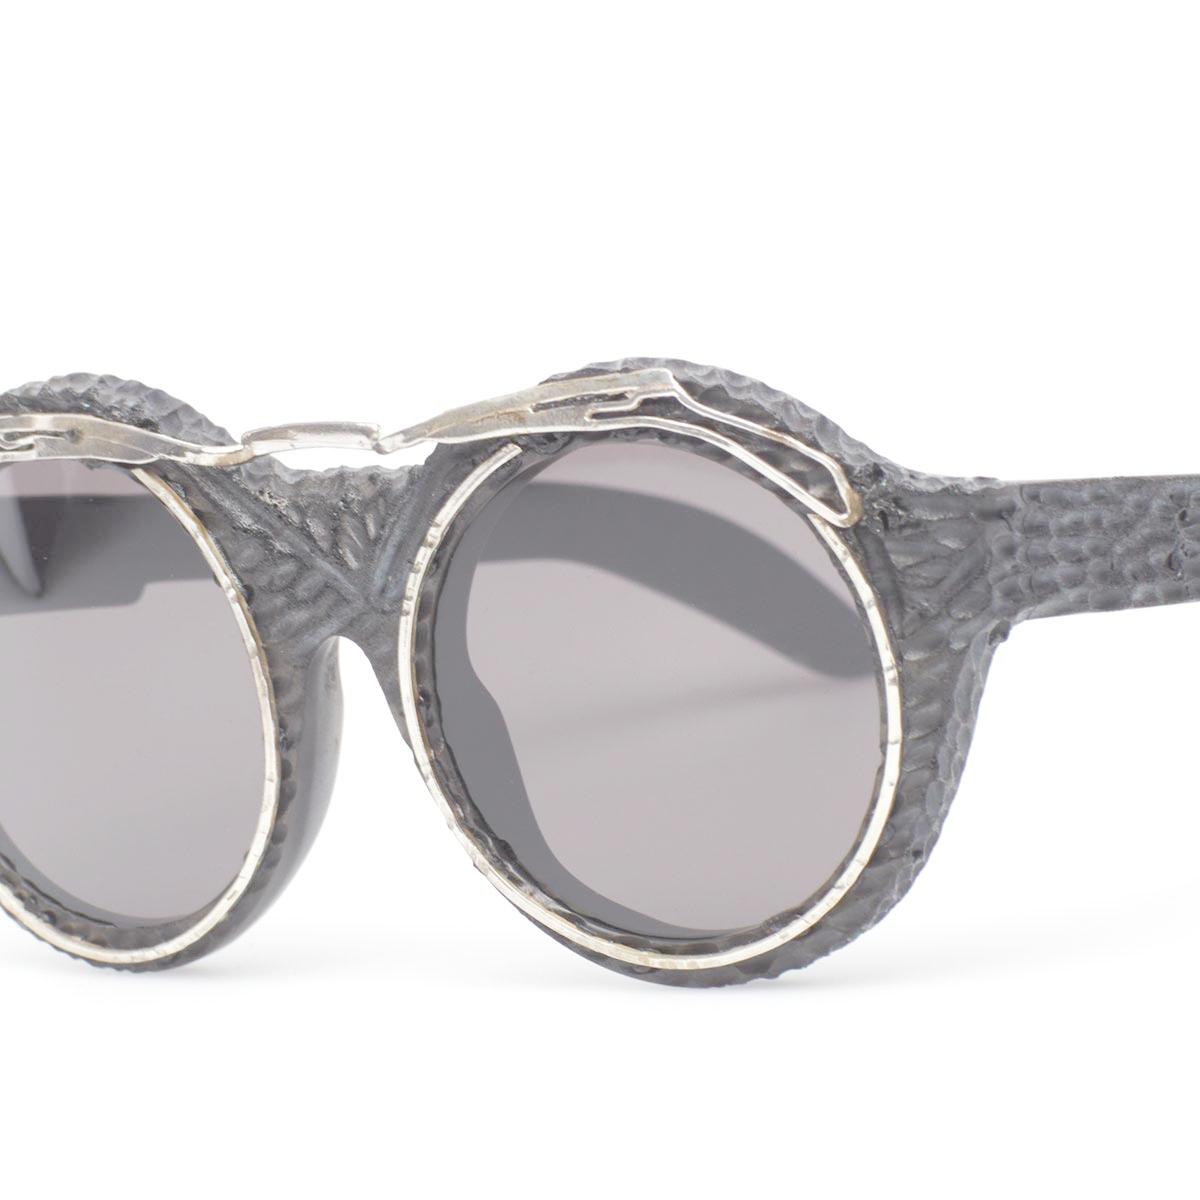 Kuboraum A2 Bm Ranx Sunglasses in Black (Purple) for Men